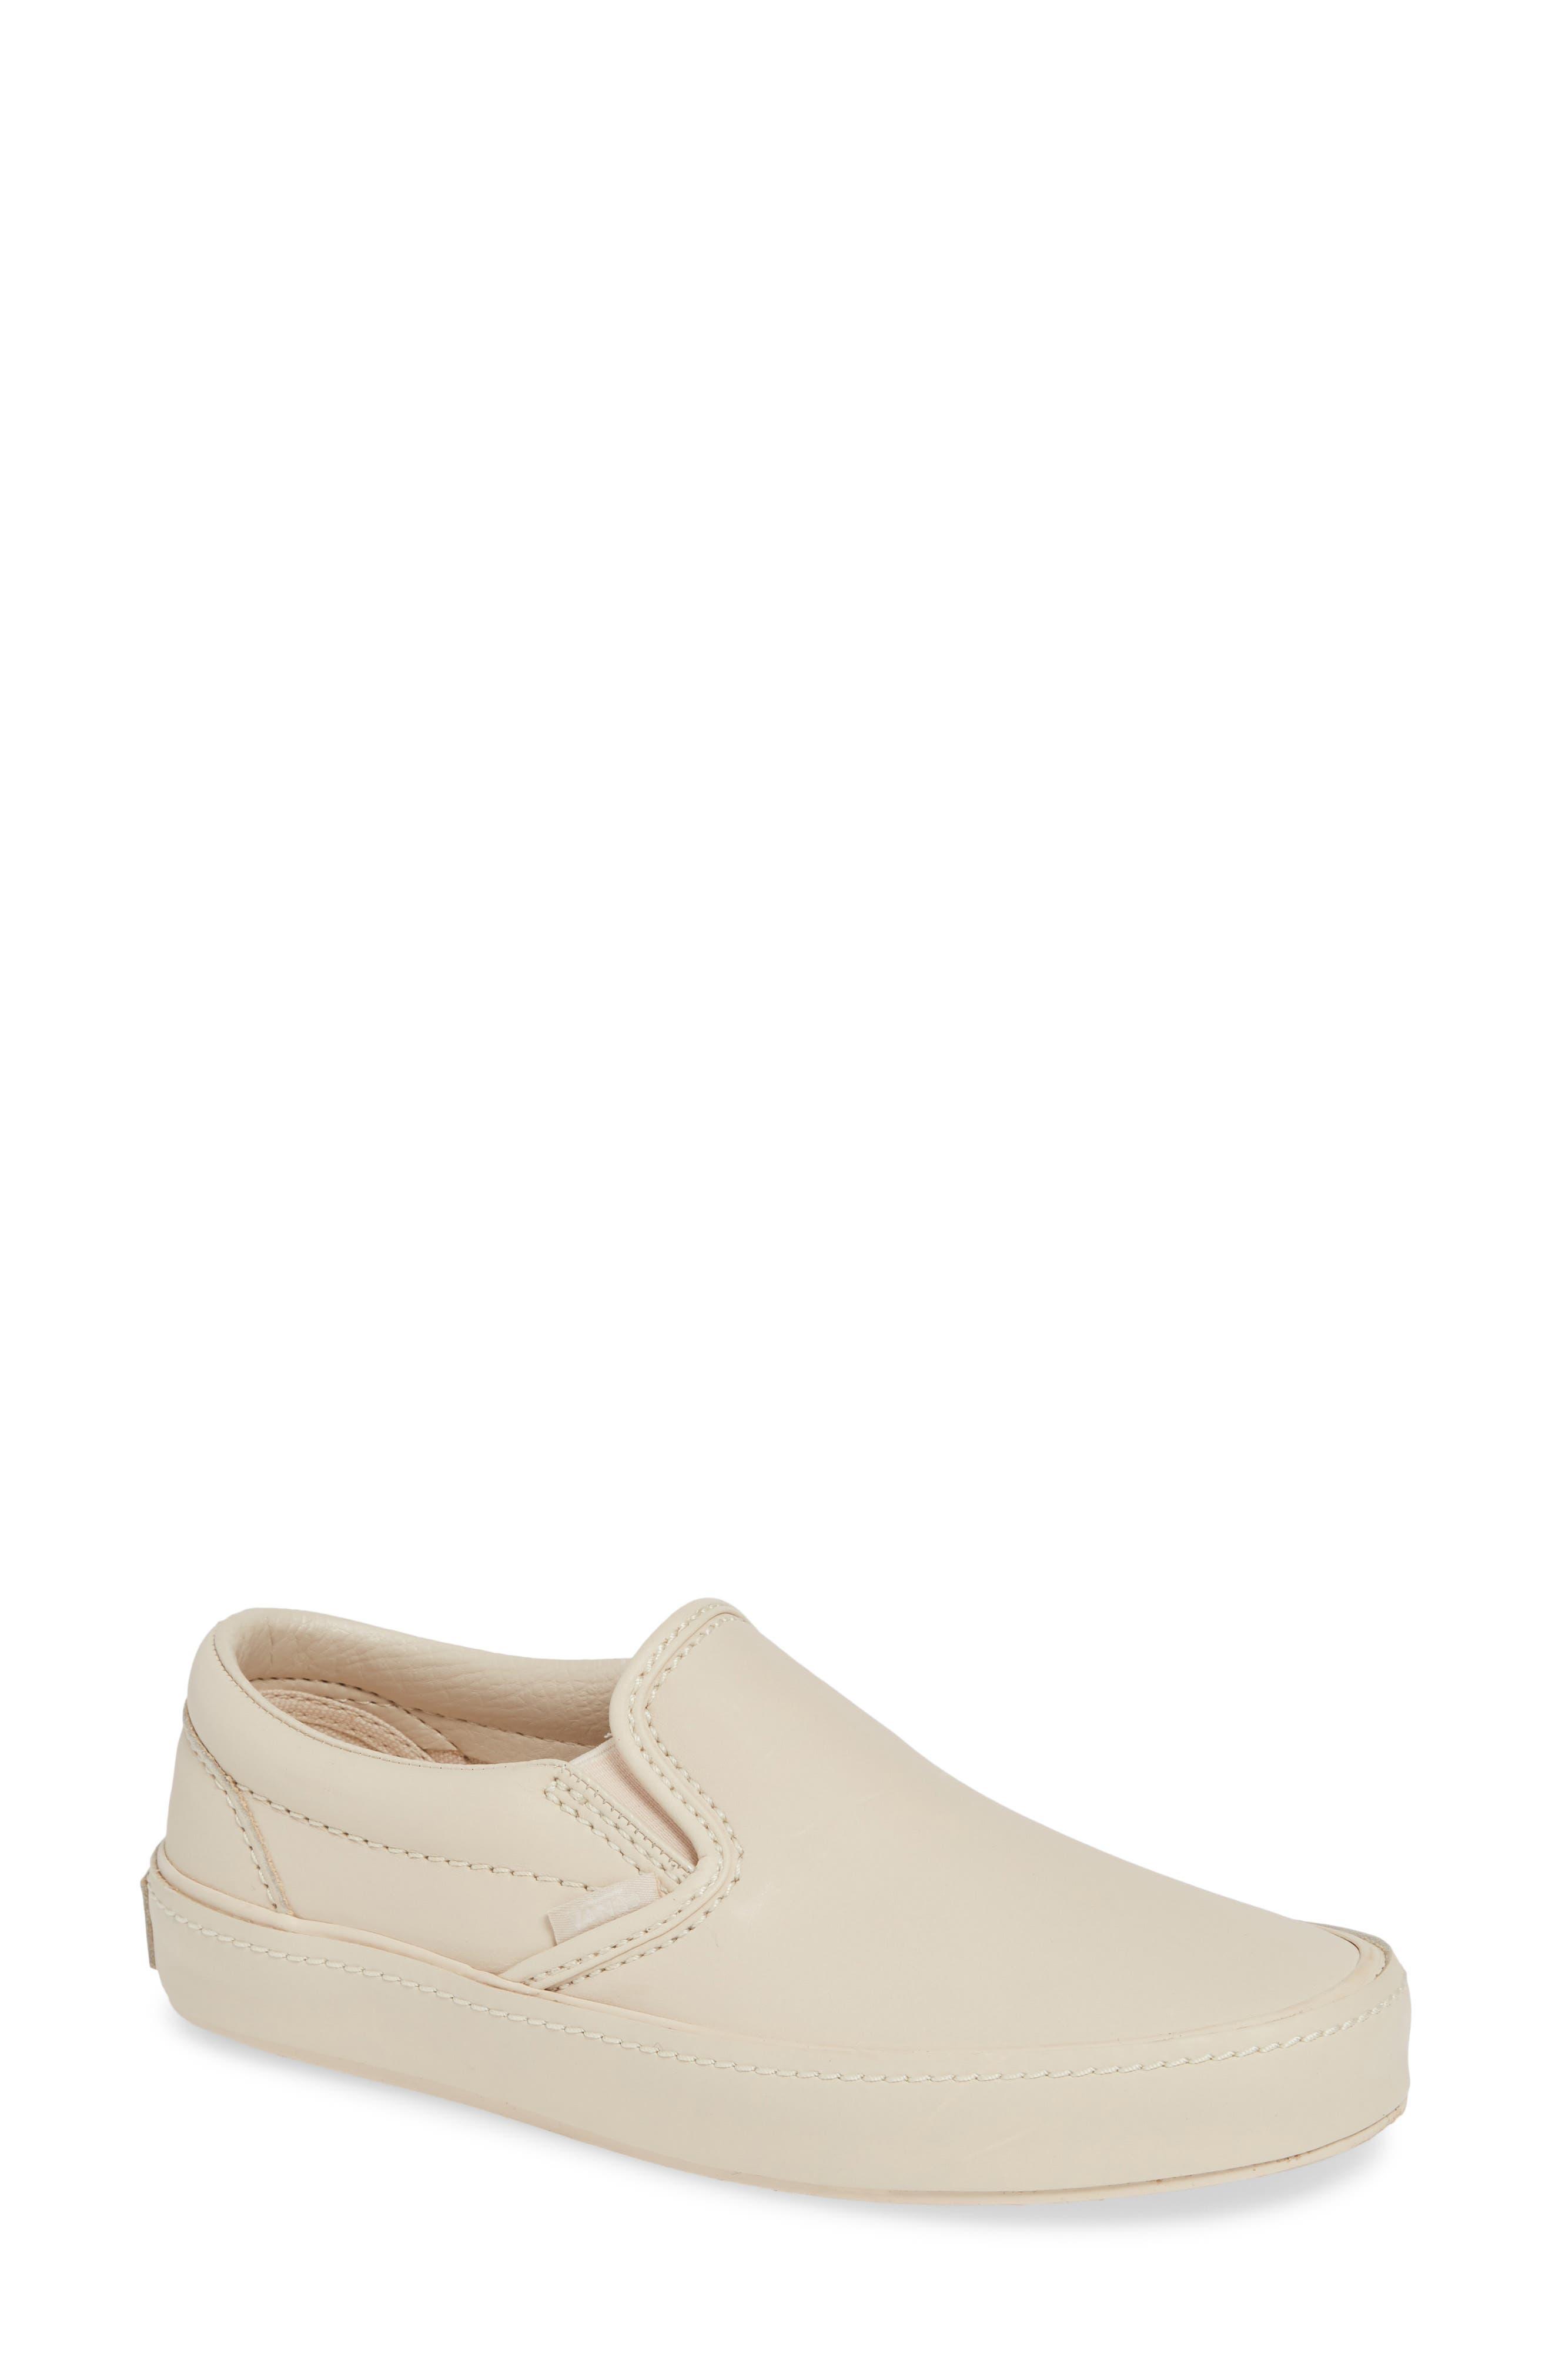 VANS,                             Classic Leather Slip-On Sneaker,                             Main thumbnail 1, color,                             270